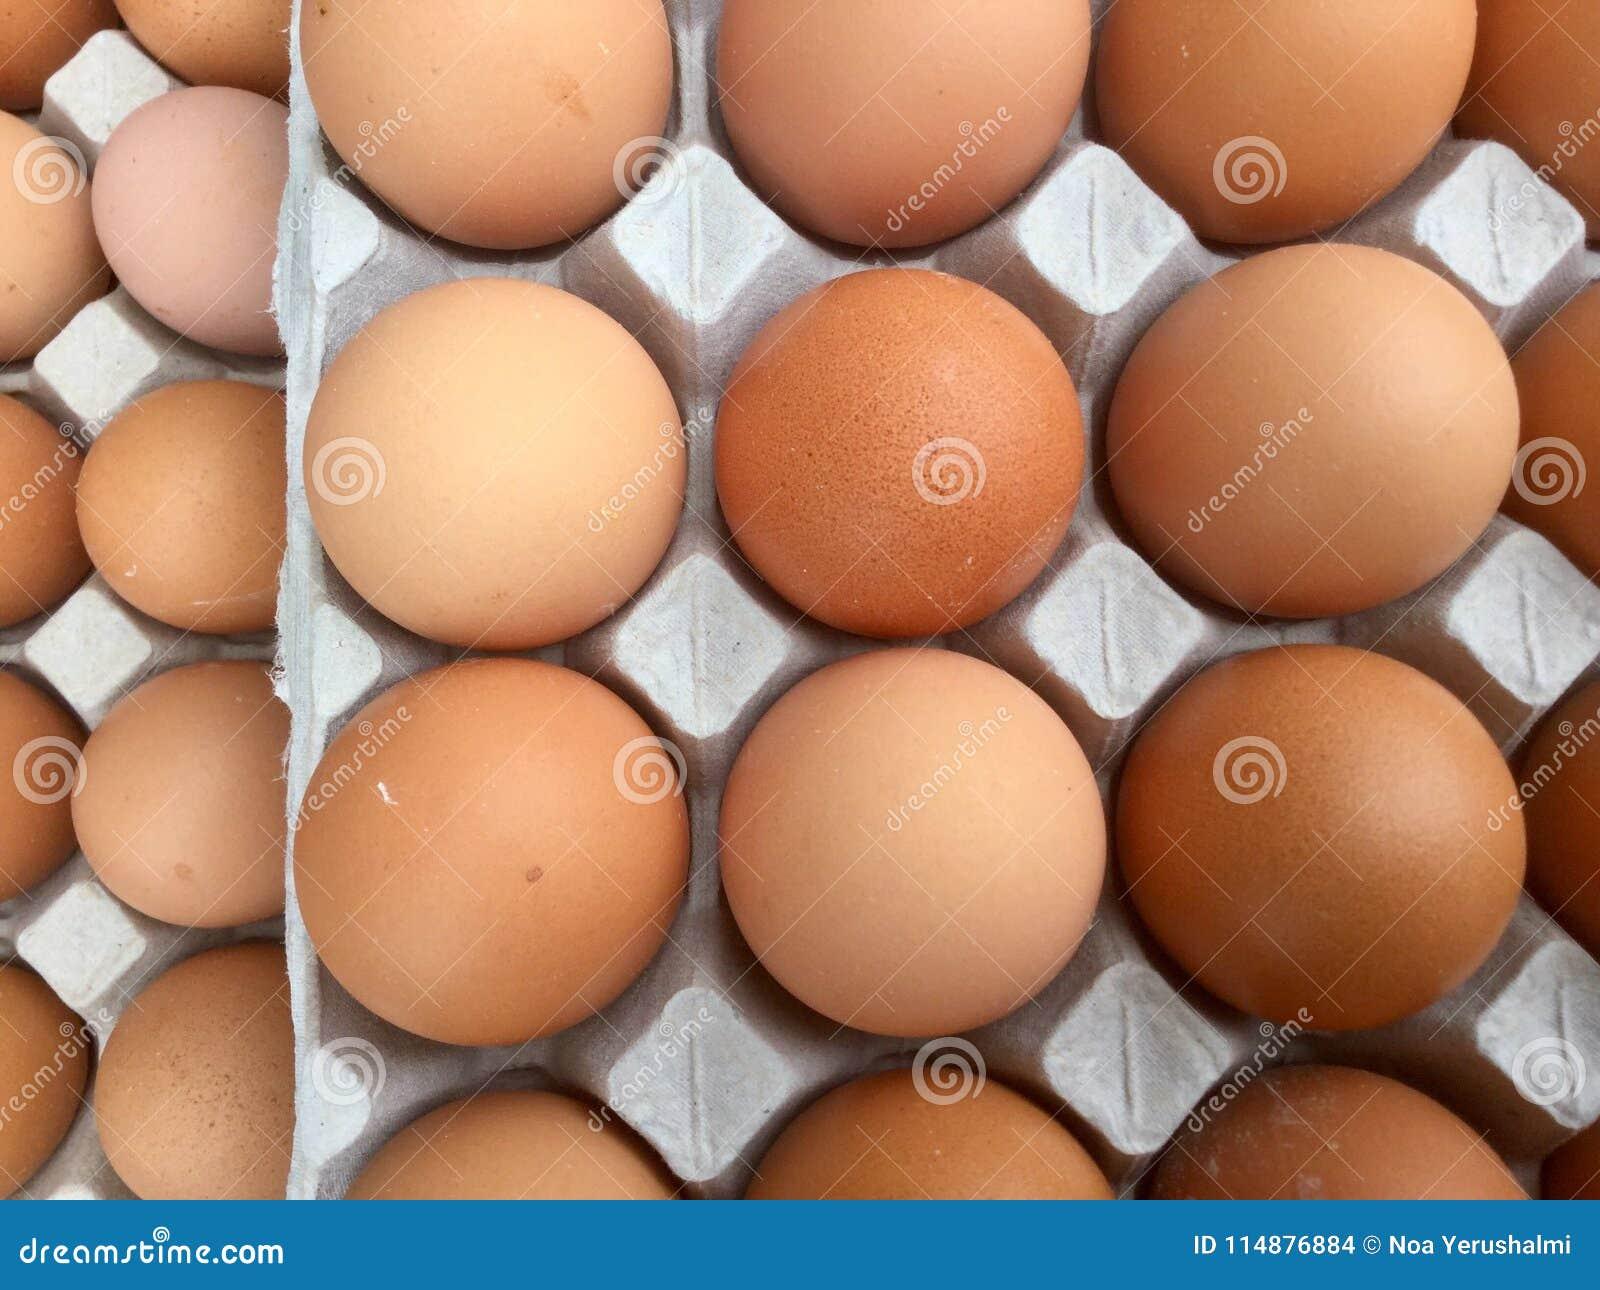 Eggs in Carton top overview Eggs In